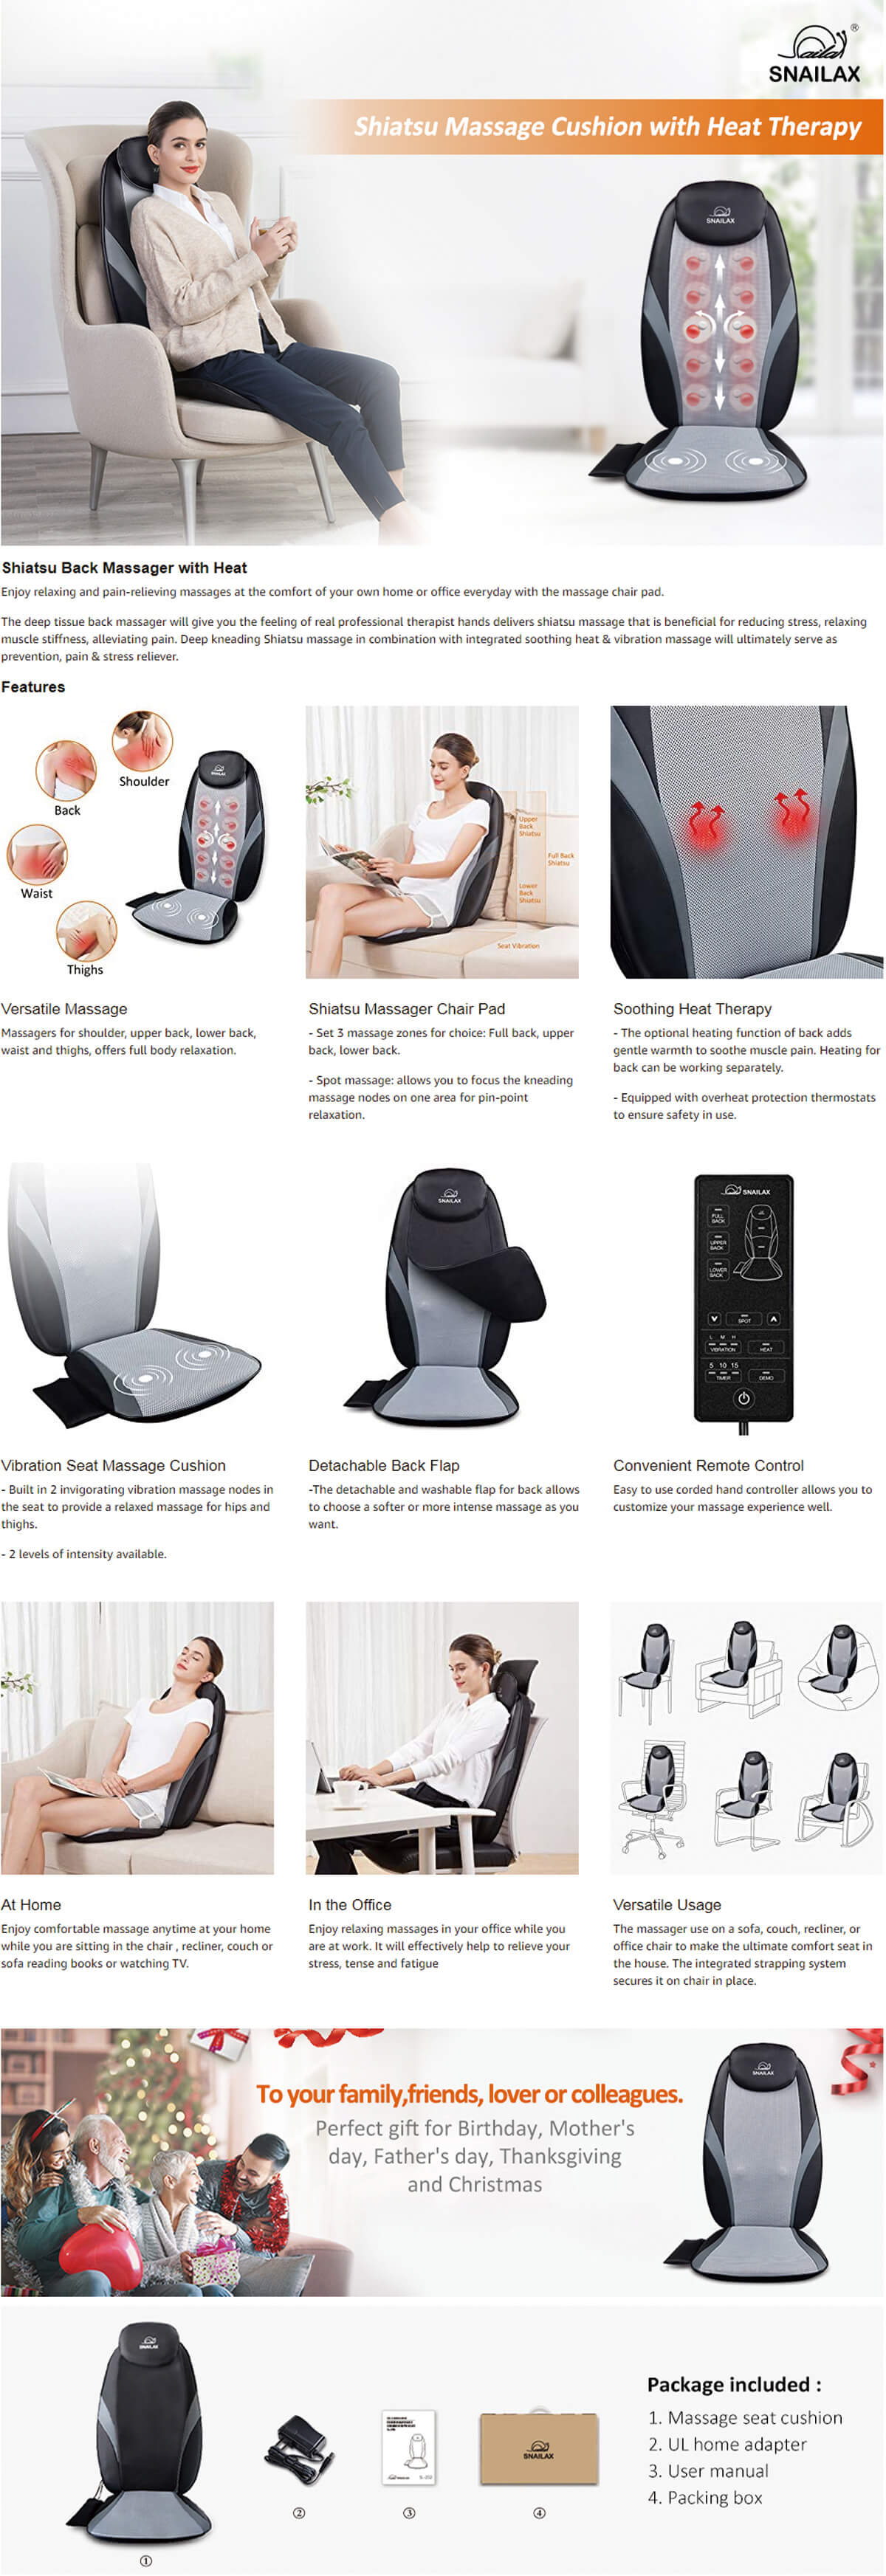 Snailax Shiatsu Back Kneading Massage Cushion Features